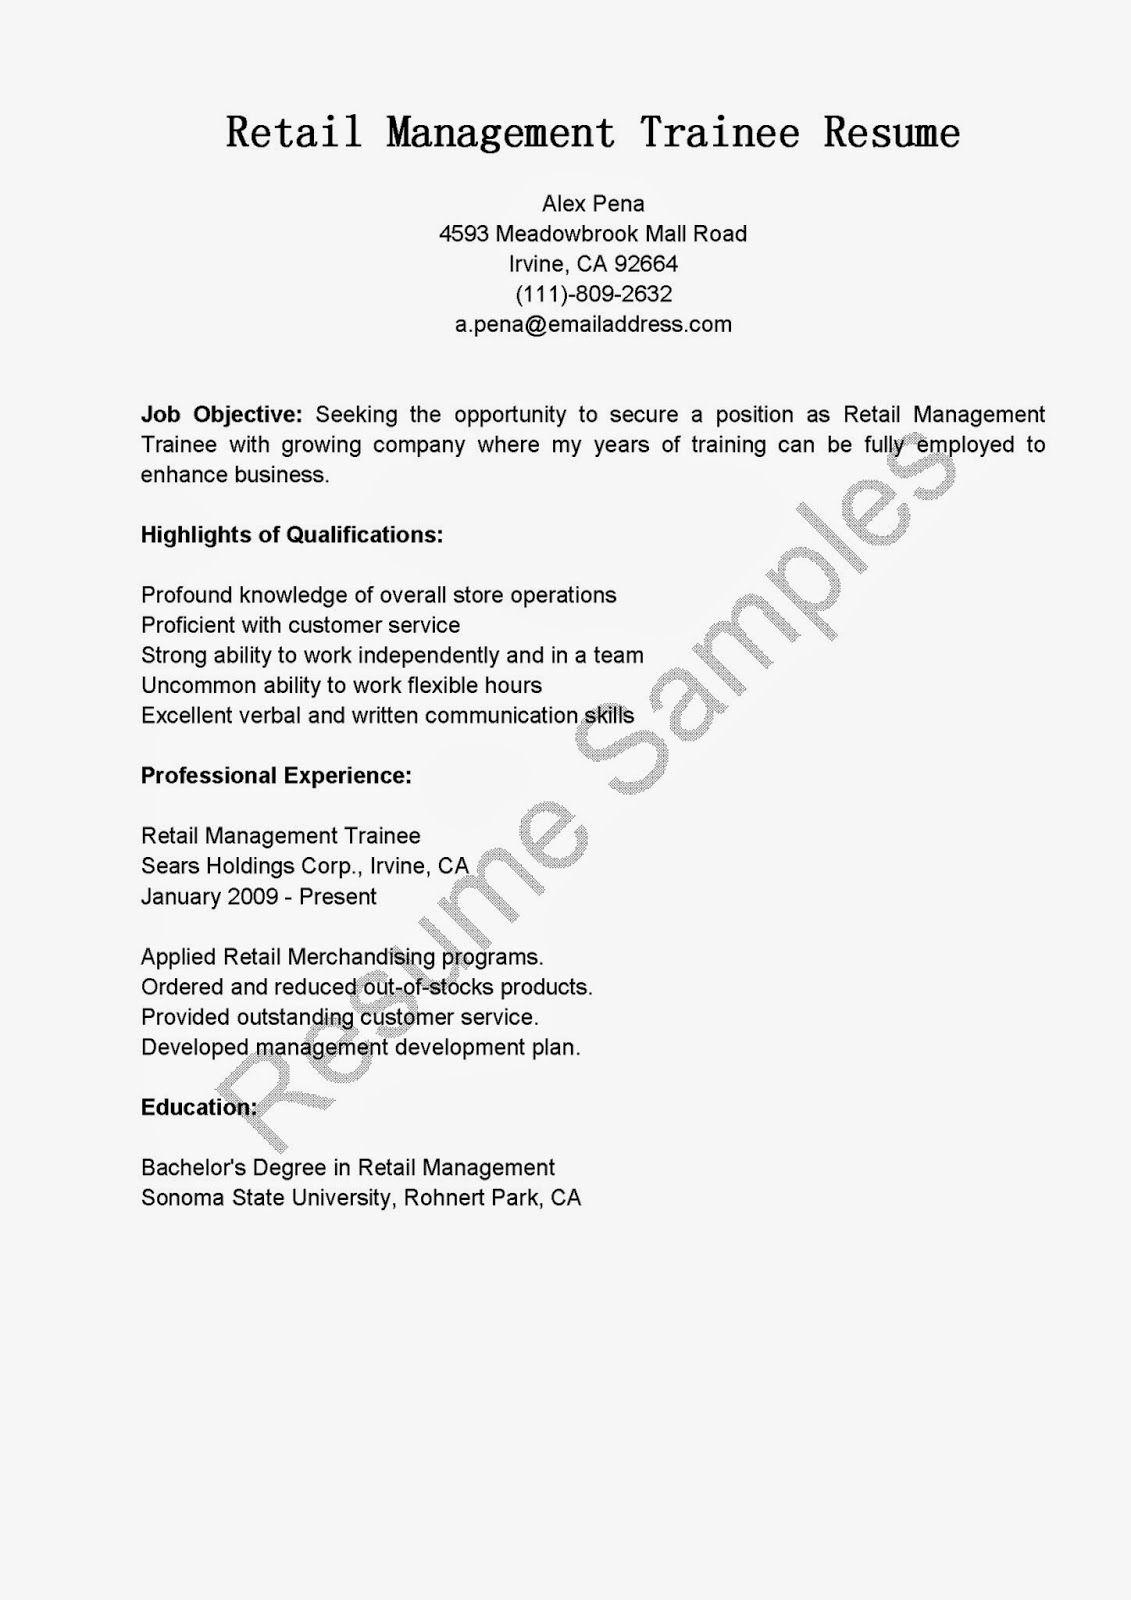 Retail Management Trainee Resume Sample Resume Management Retail